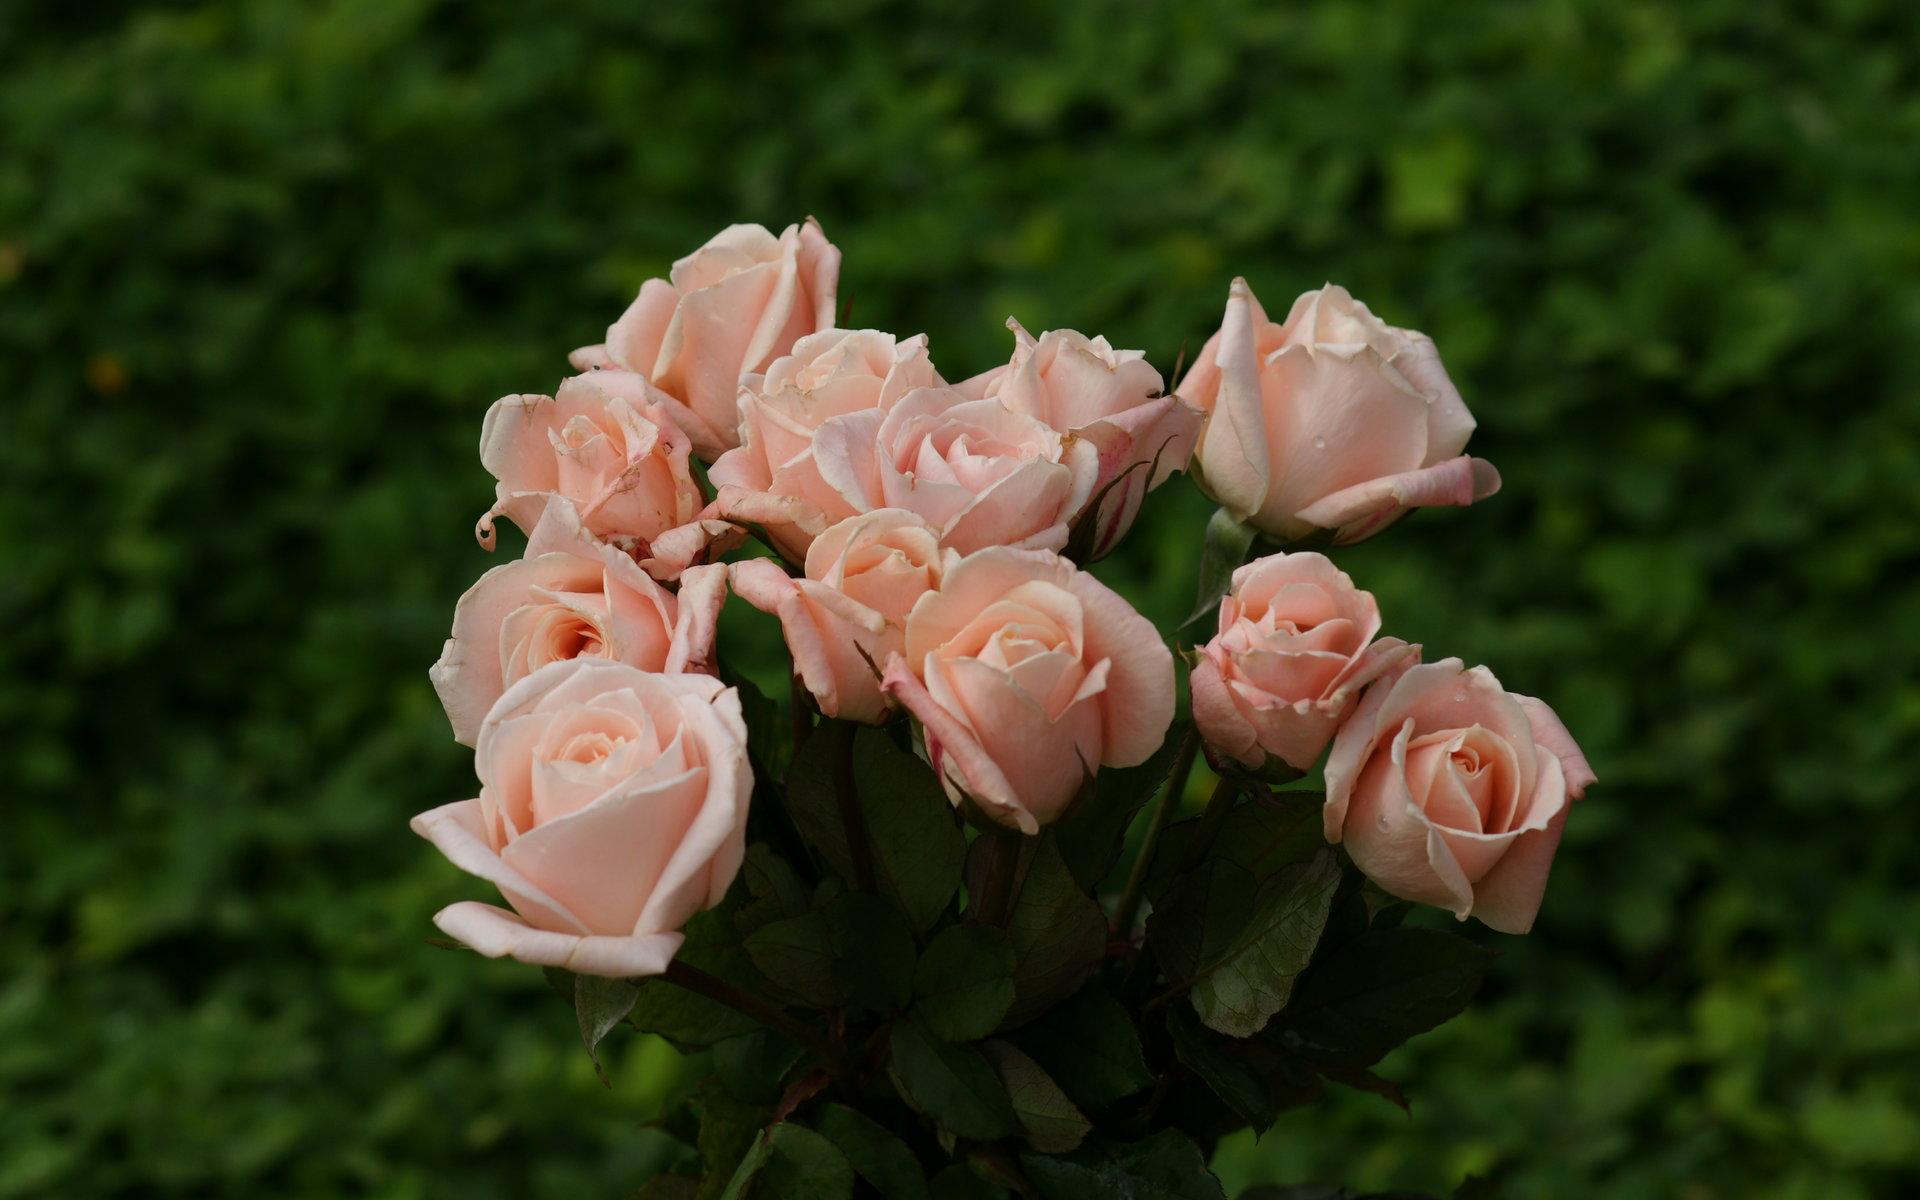 Roses Widescreen Wallpaper